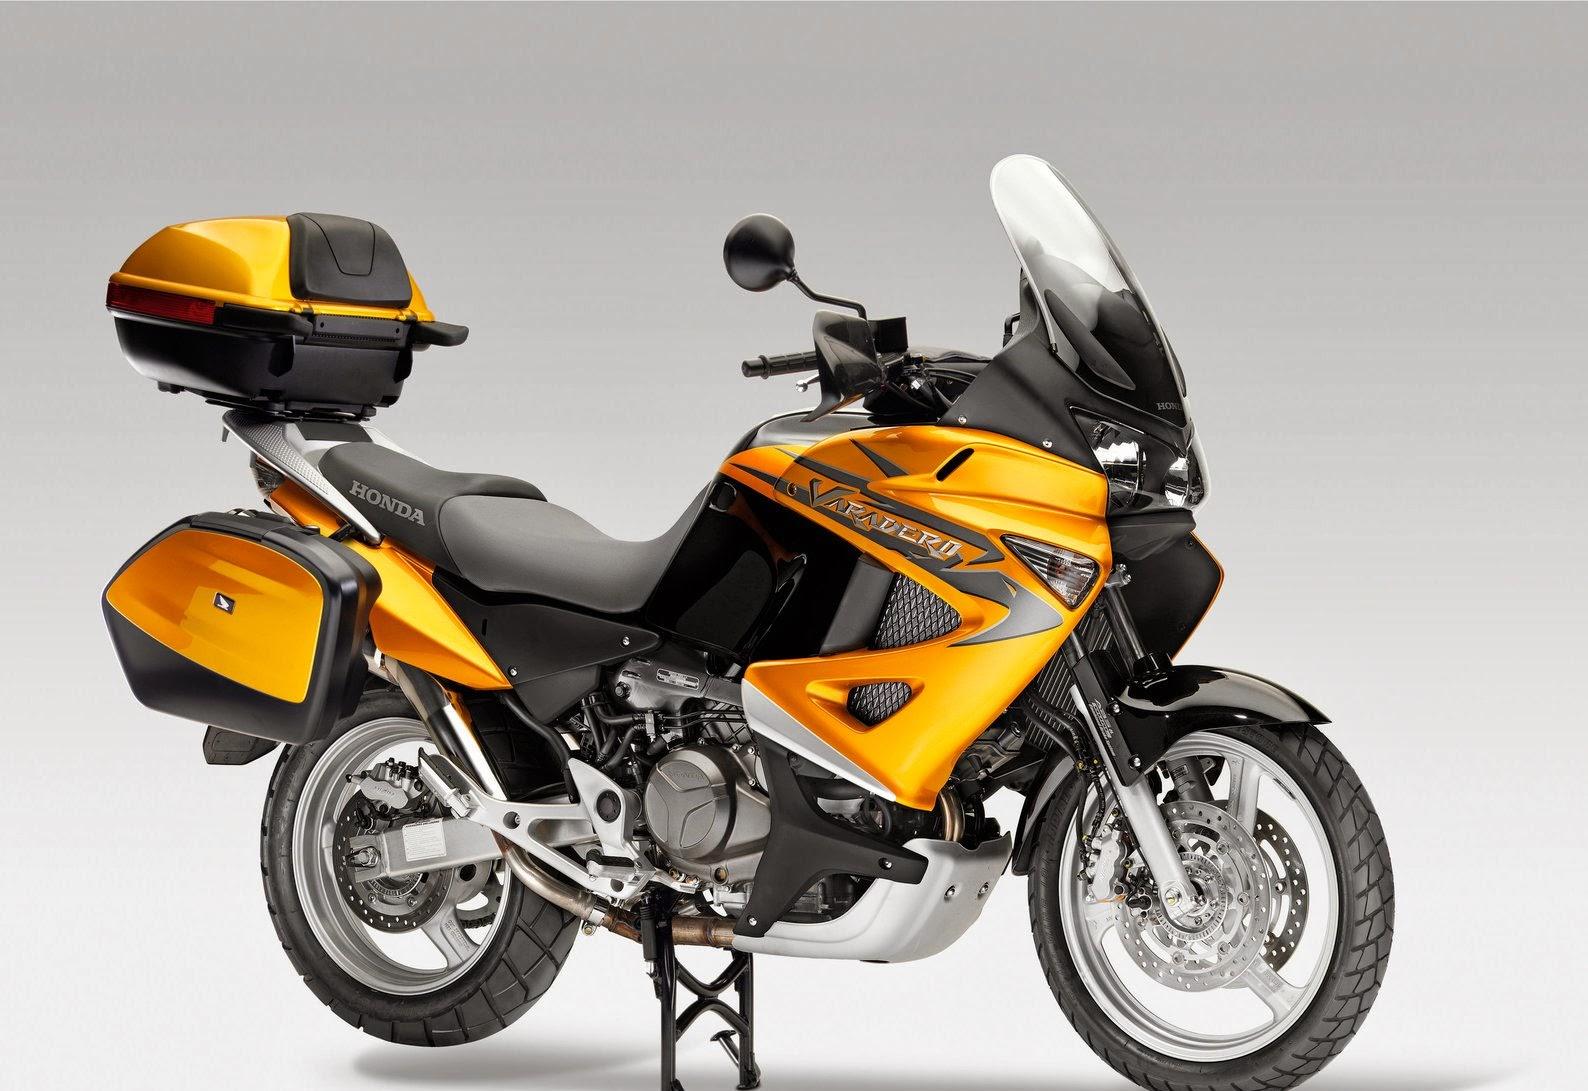 bike cars hd wallpapers honda varadero motorcycle photo. Black Bedroom Furniture Sets. Home Design Ideas